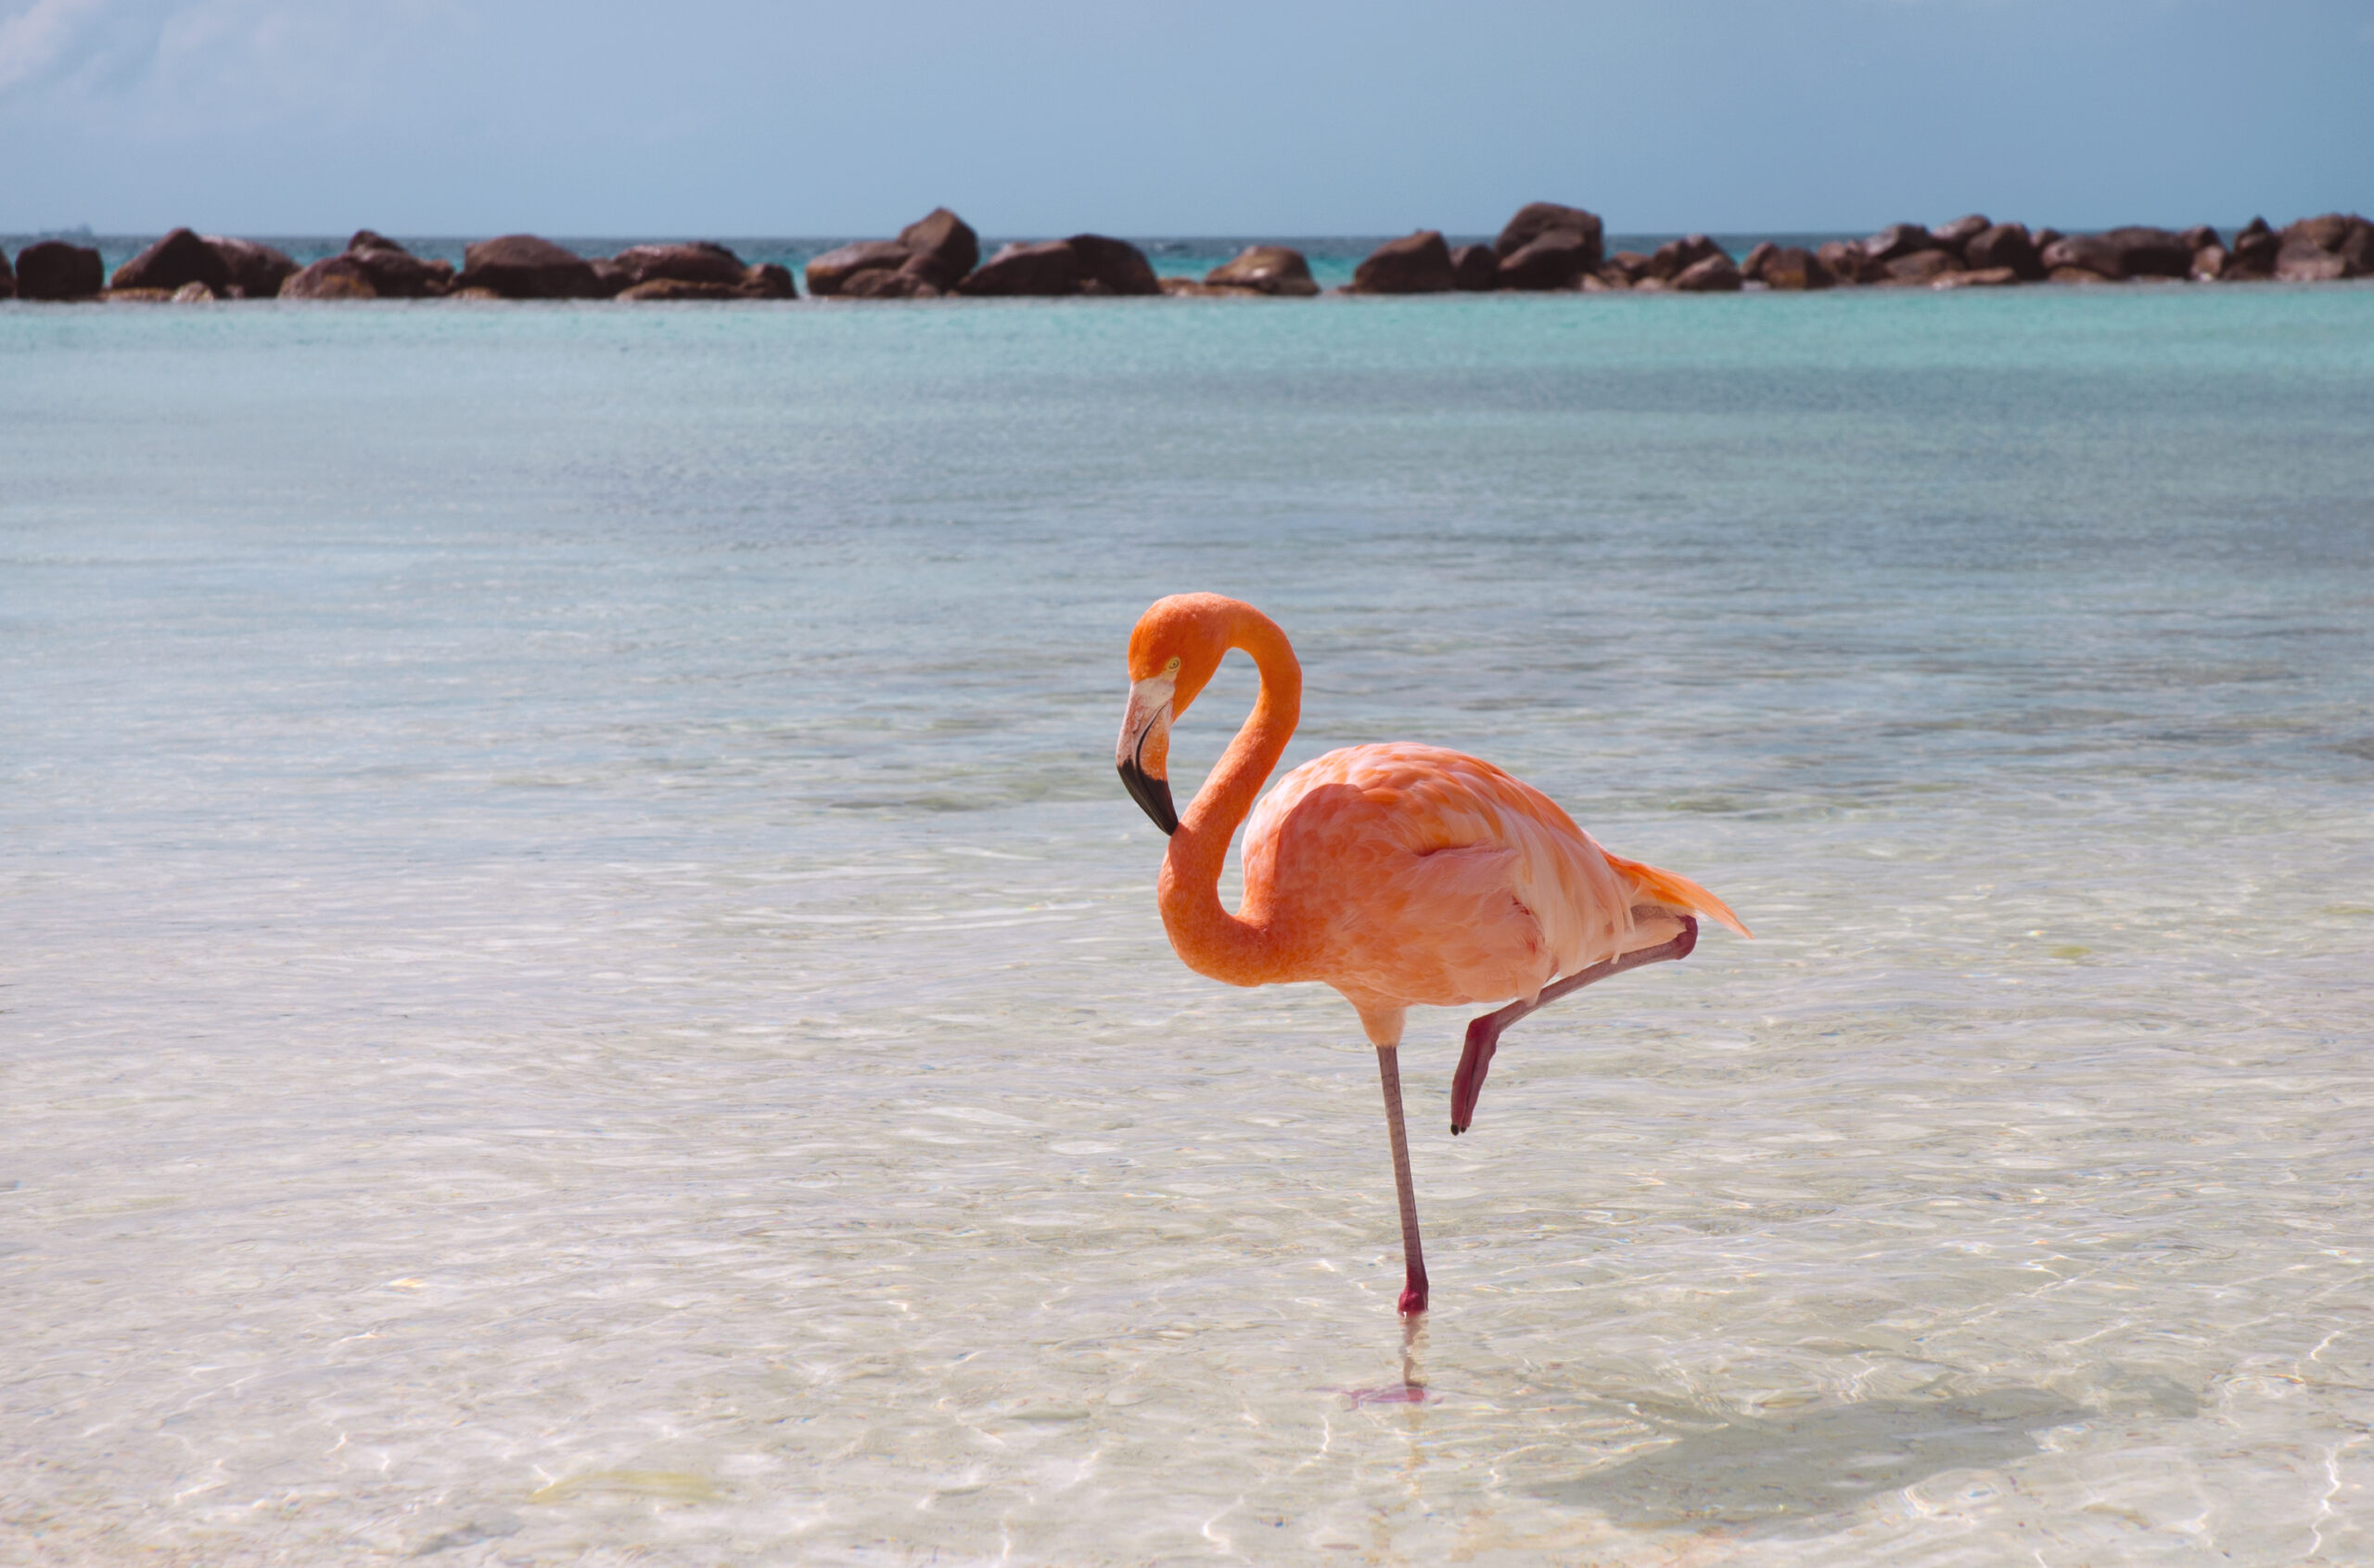 Почему фламинго стоят на одной ноге?